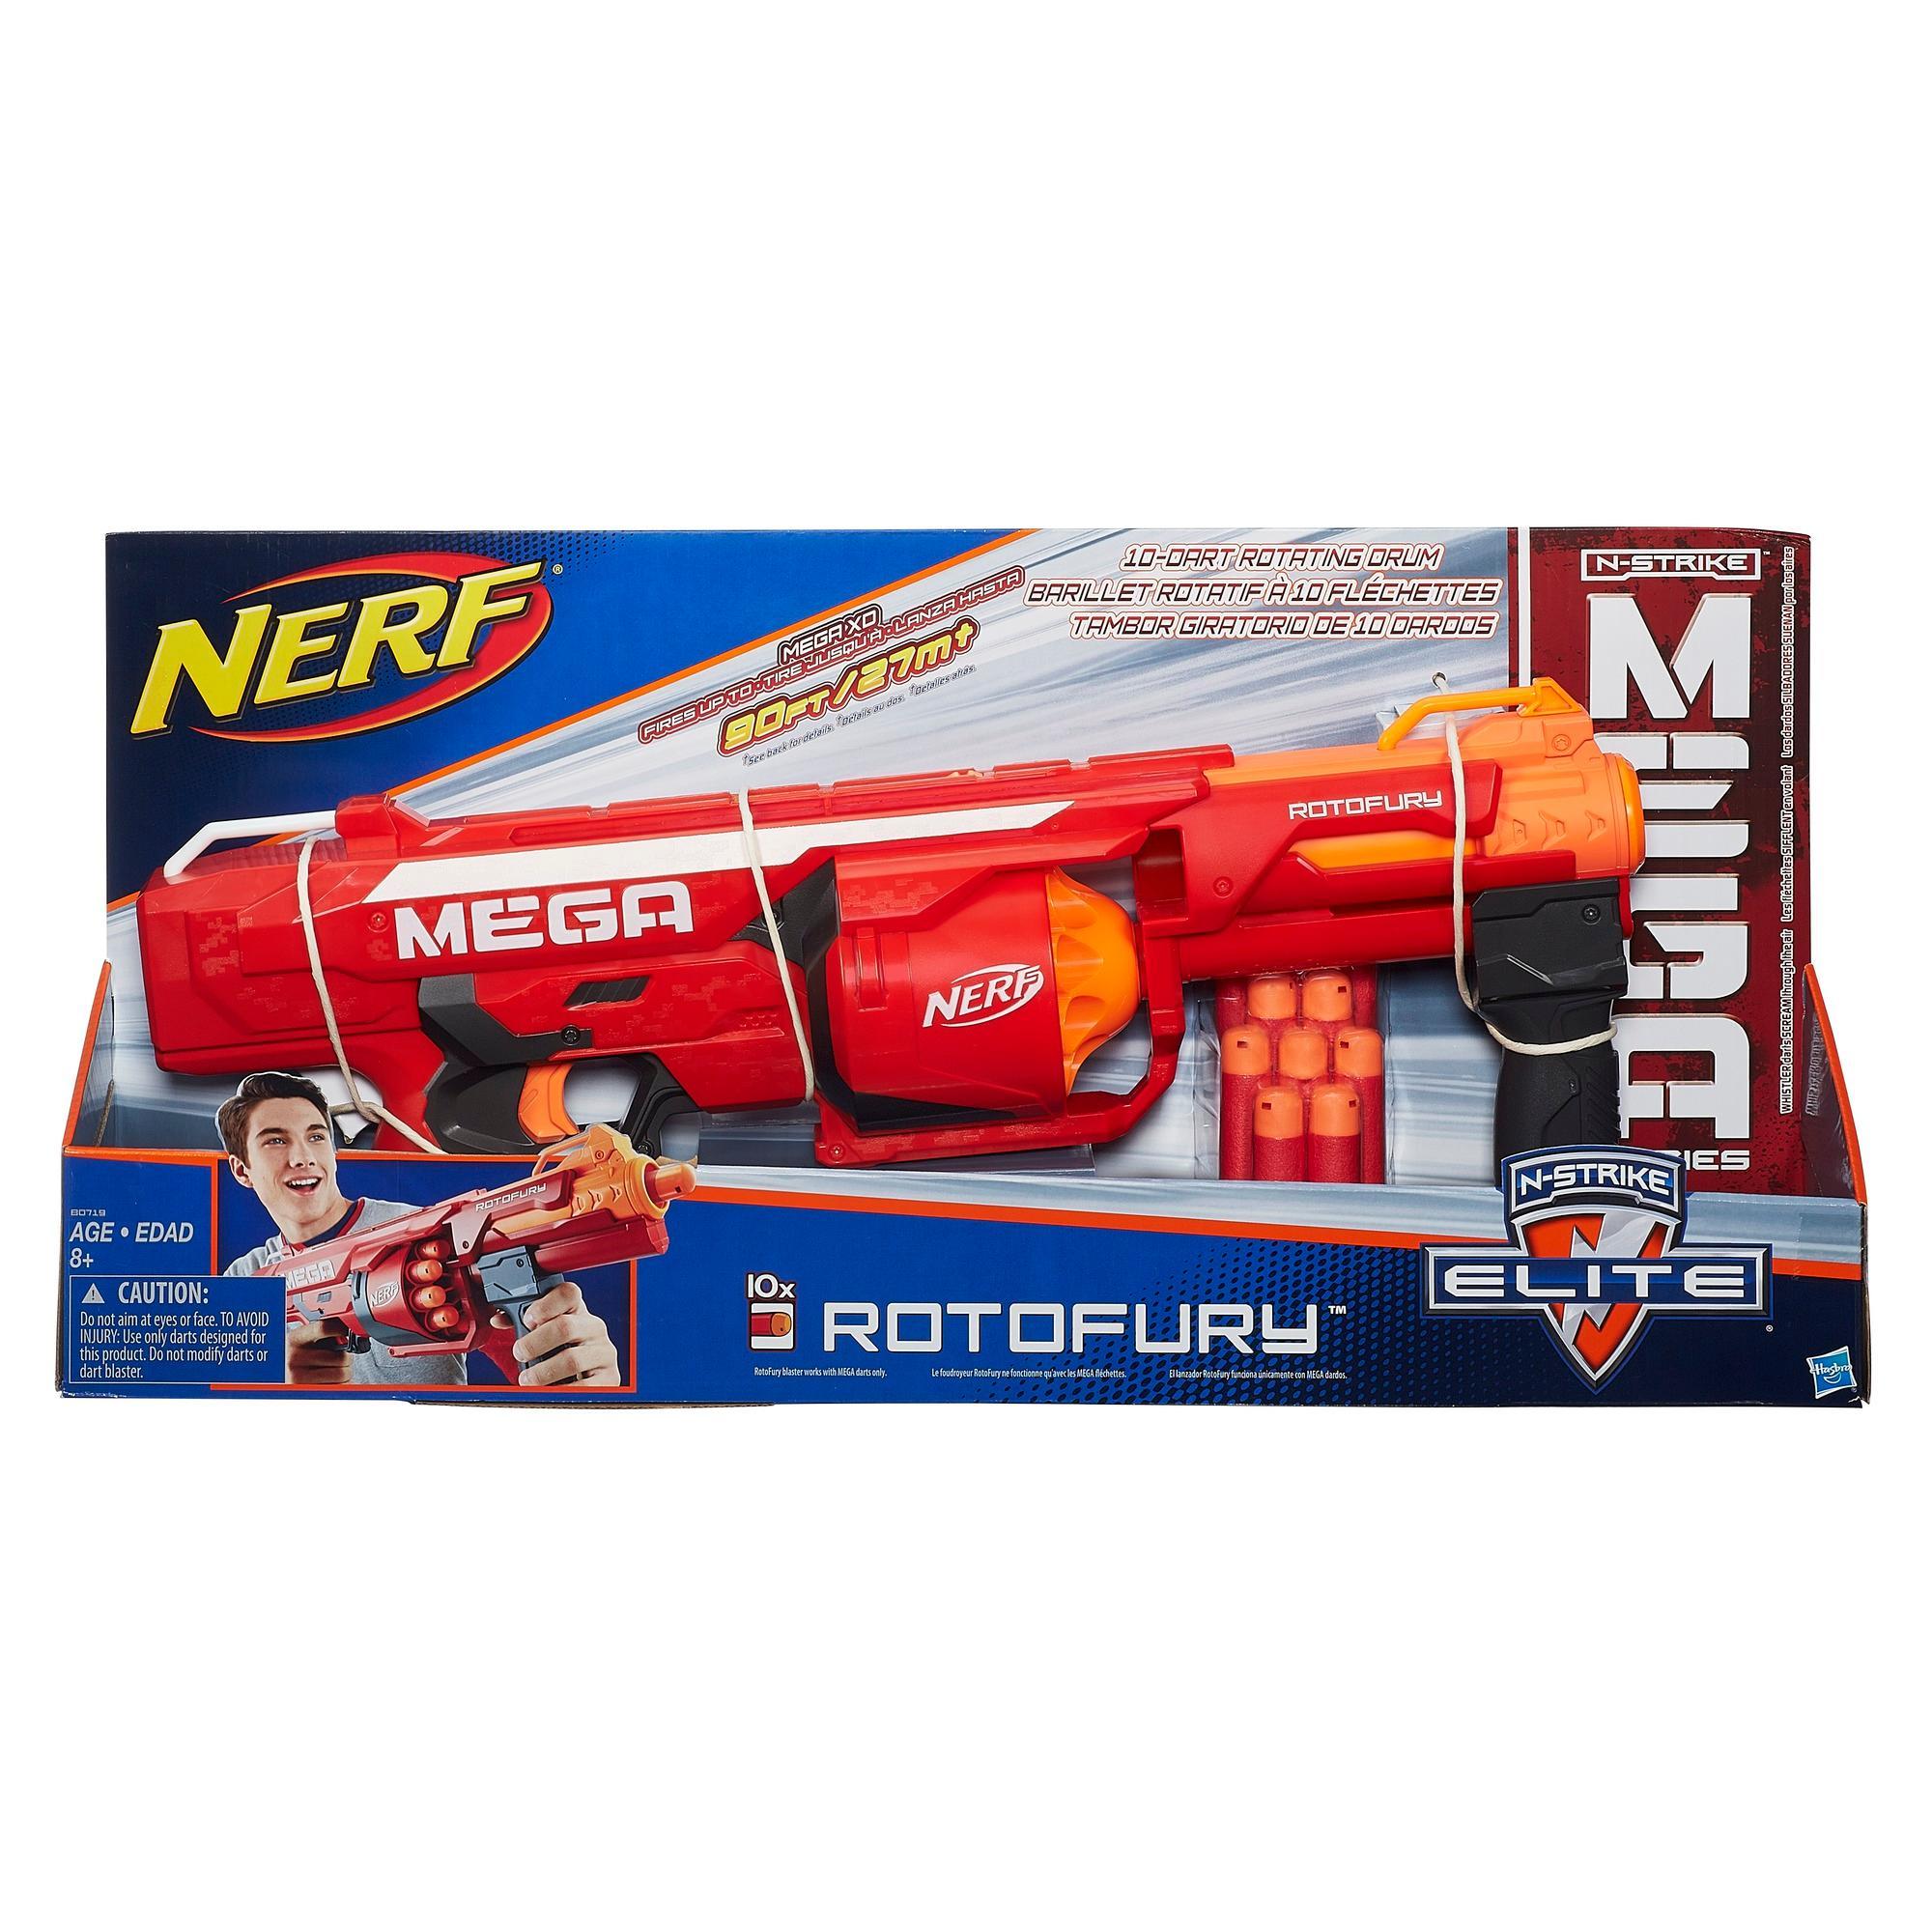 mega mastodon nerf gun instructions